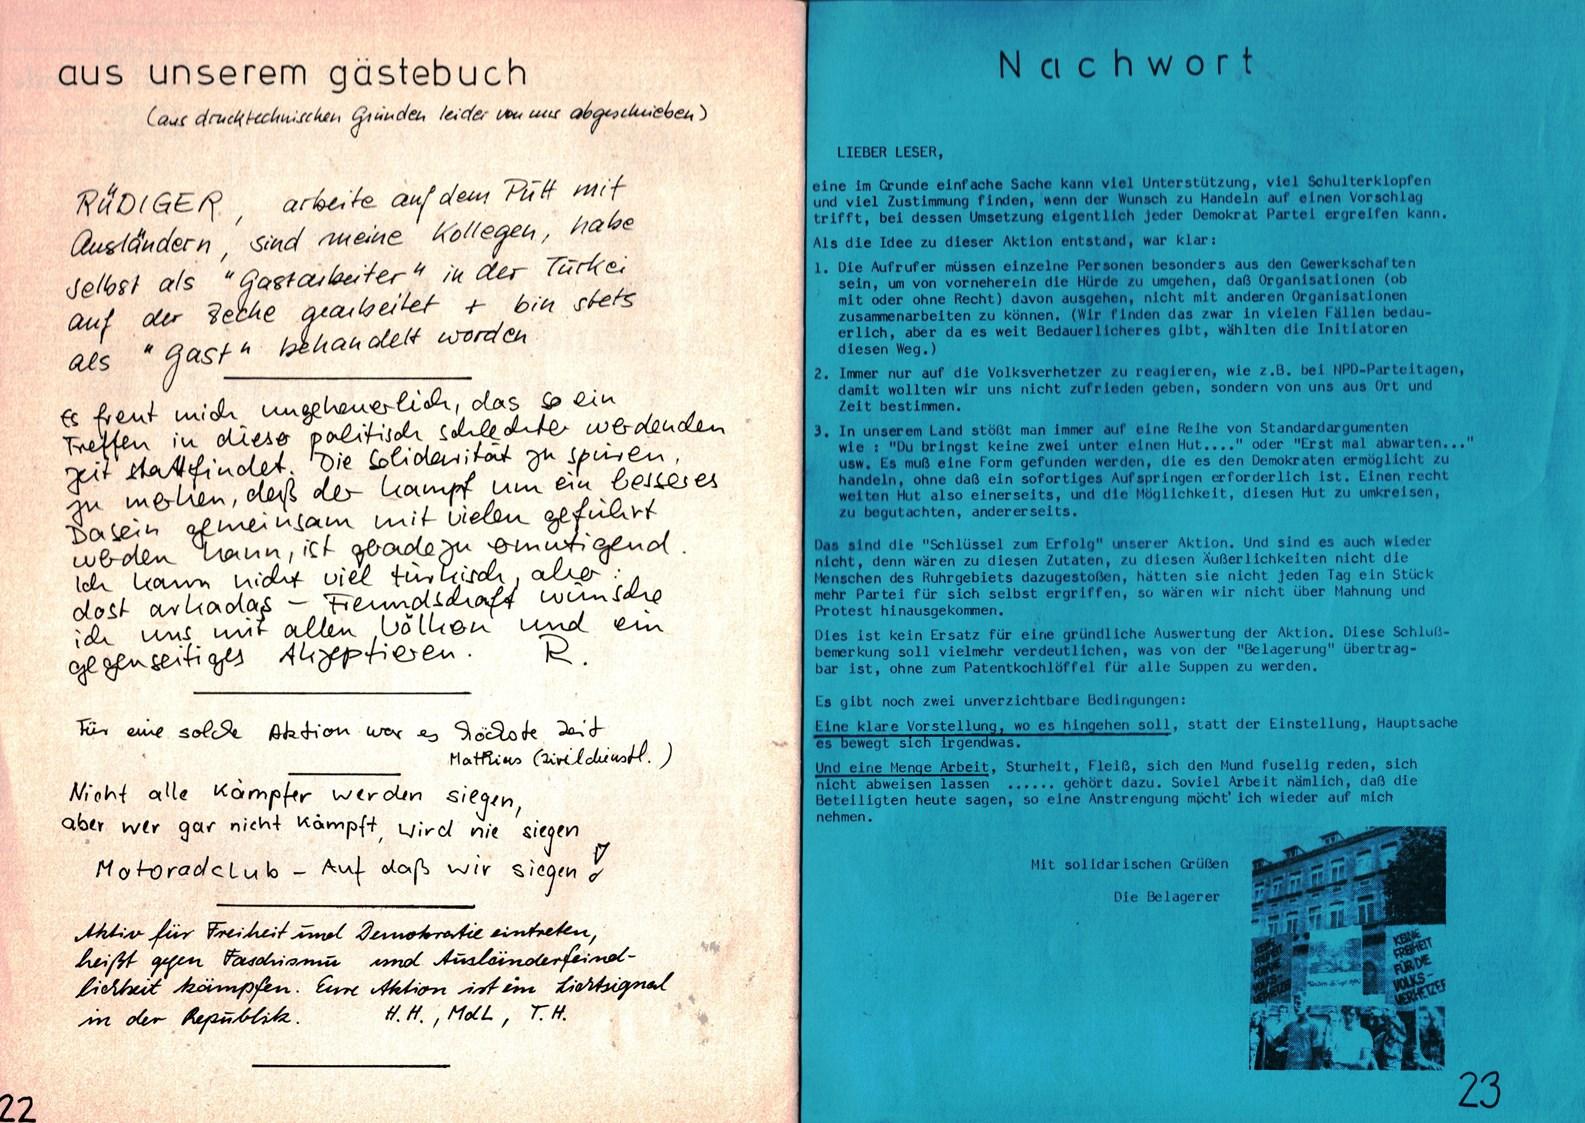 Bochum_1982_BI_Auslaenderstopp_belagern_014